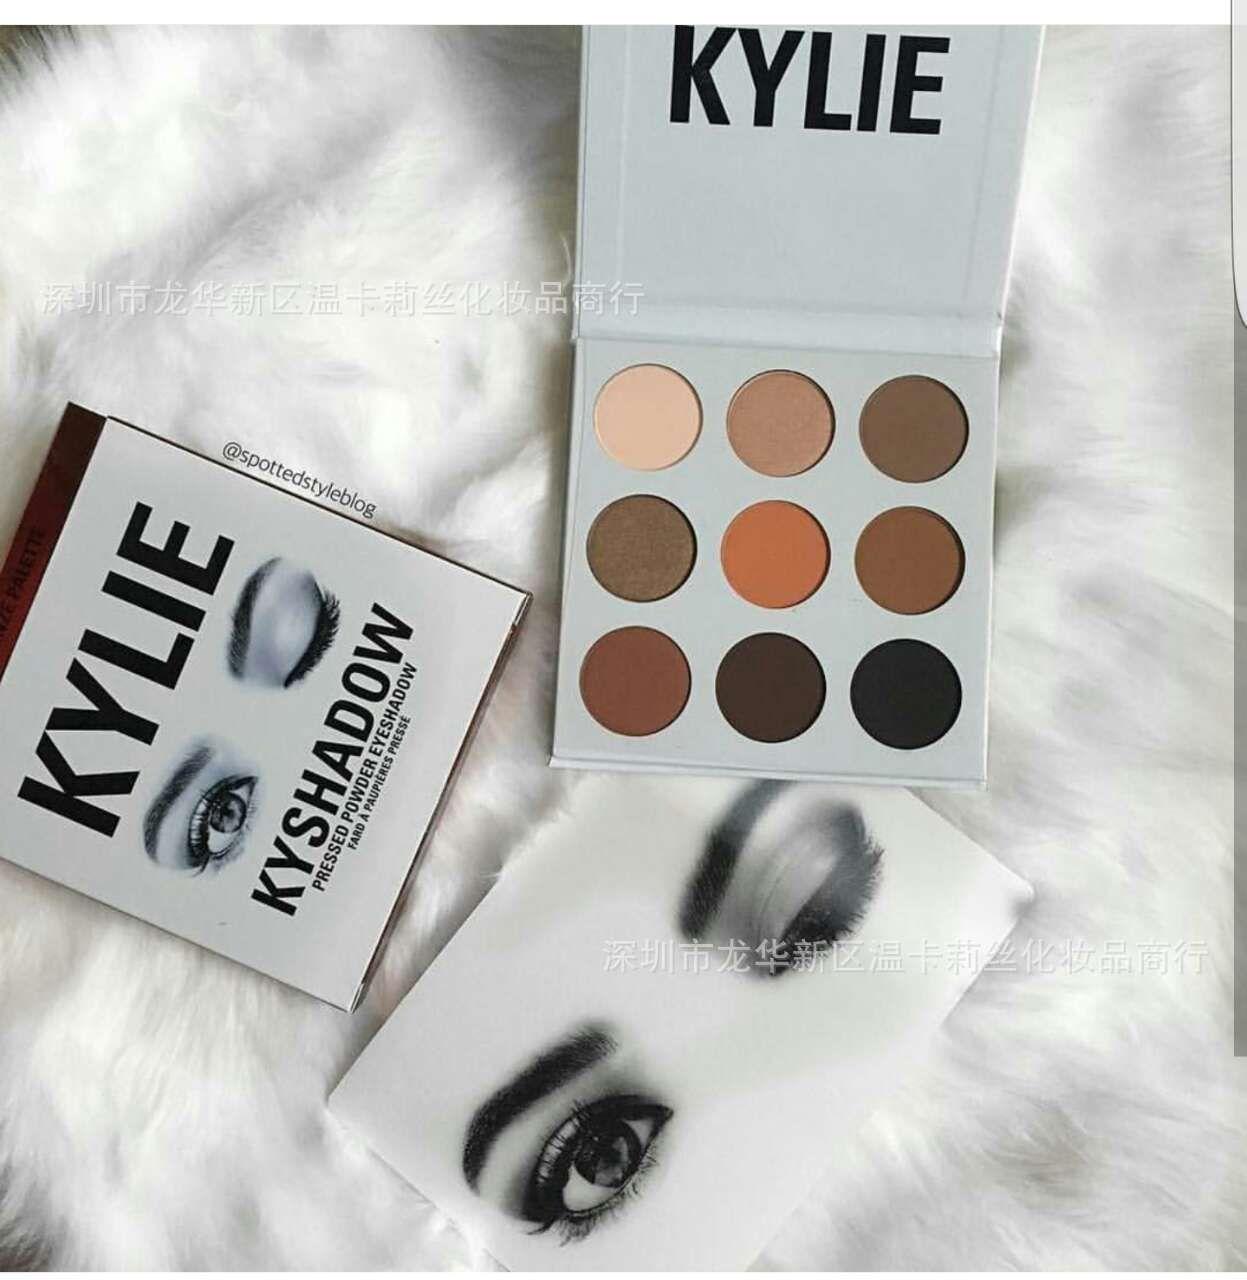 Kylie Kyshadow Pressed Powder Eyeshadow Palette Palettes Bronze Matte  Cosmetics Makeup +gift New Arrival Hot